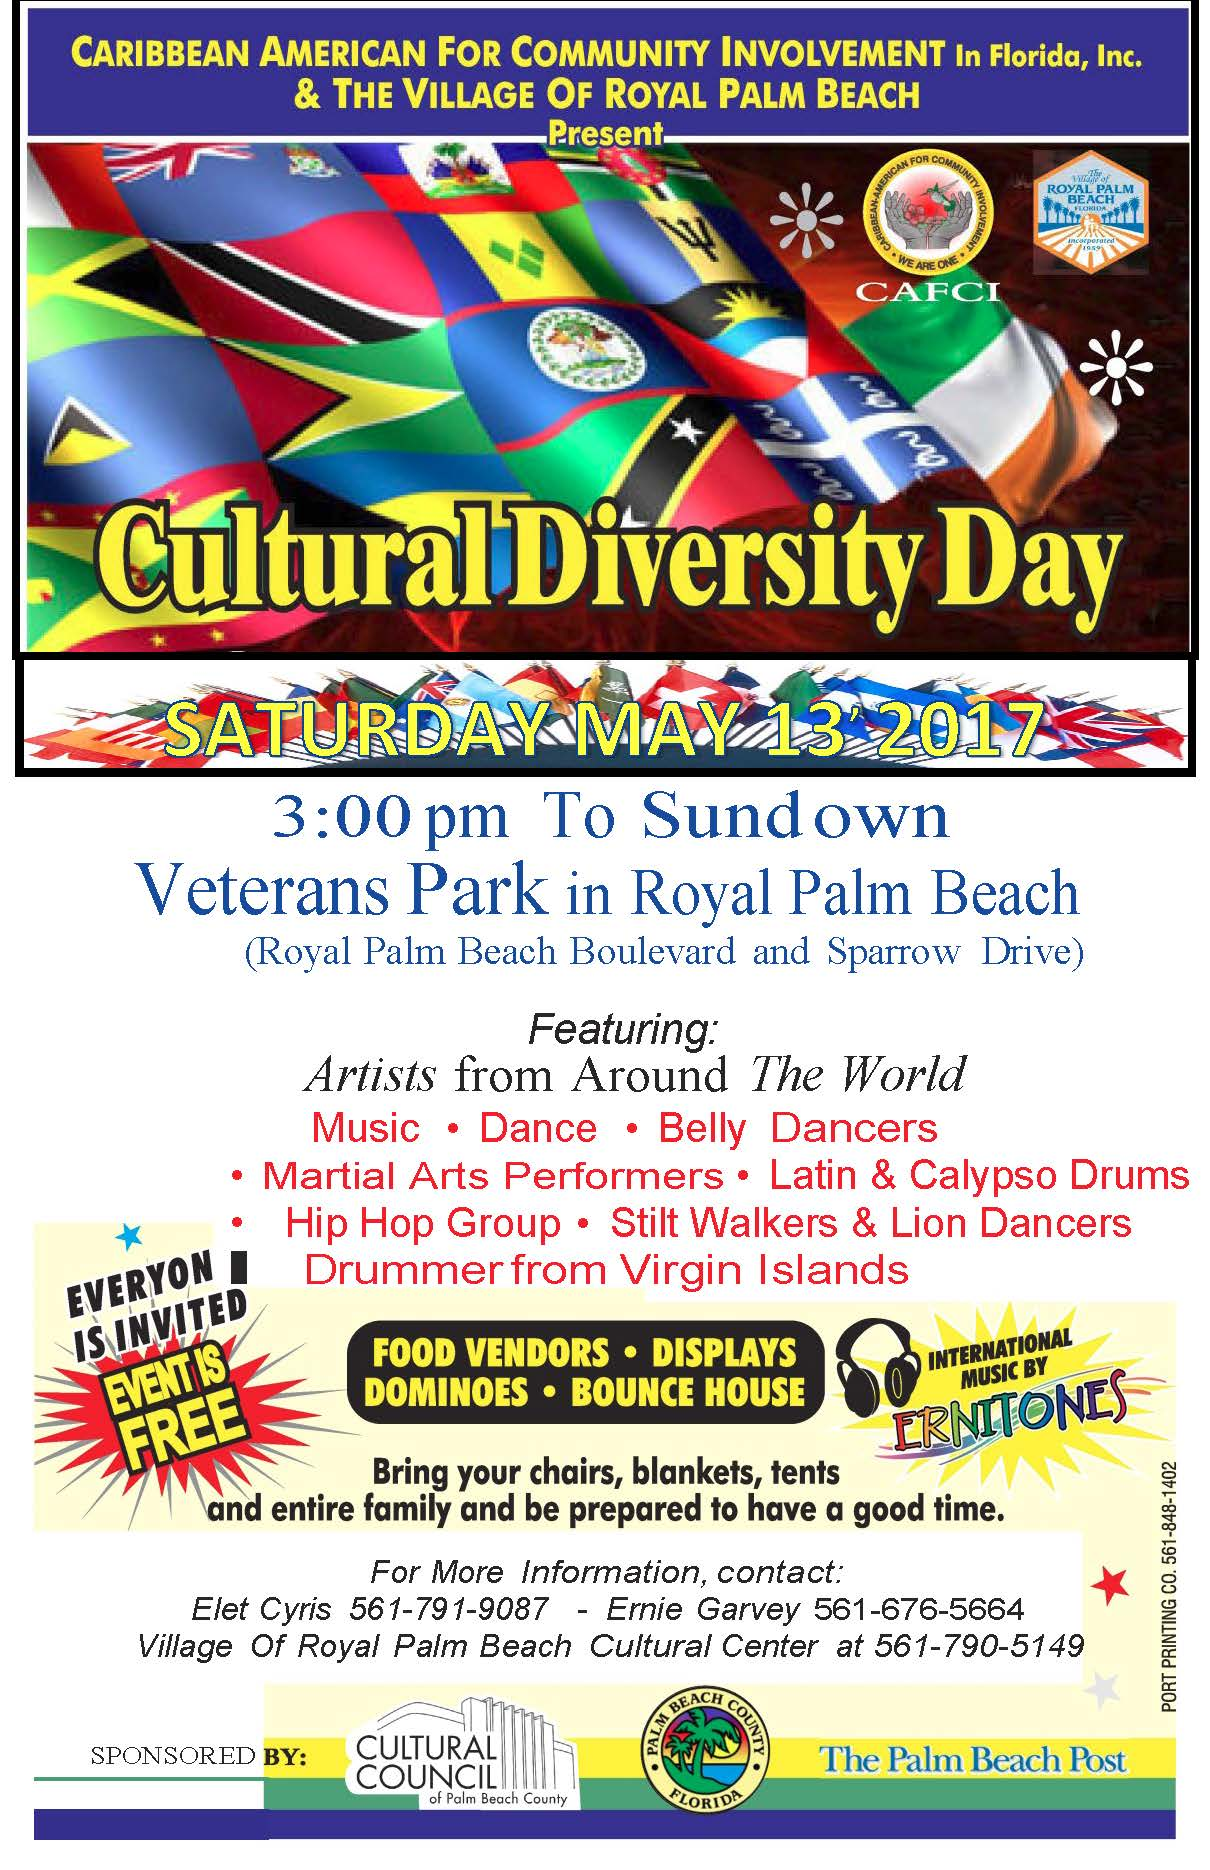 Cultural_Diversity_Day_Flyer_2017.jpg